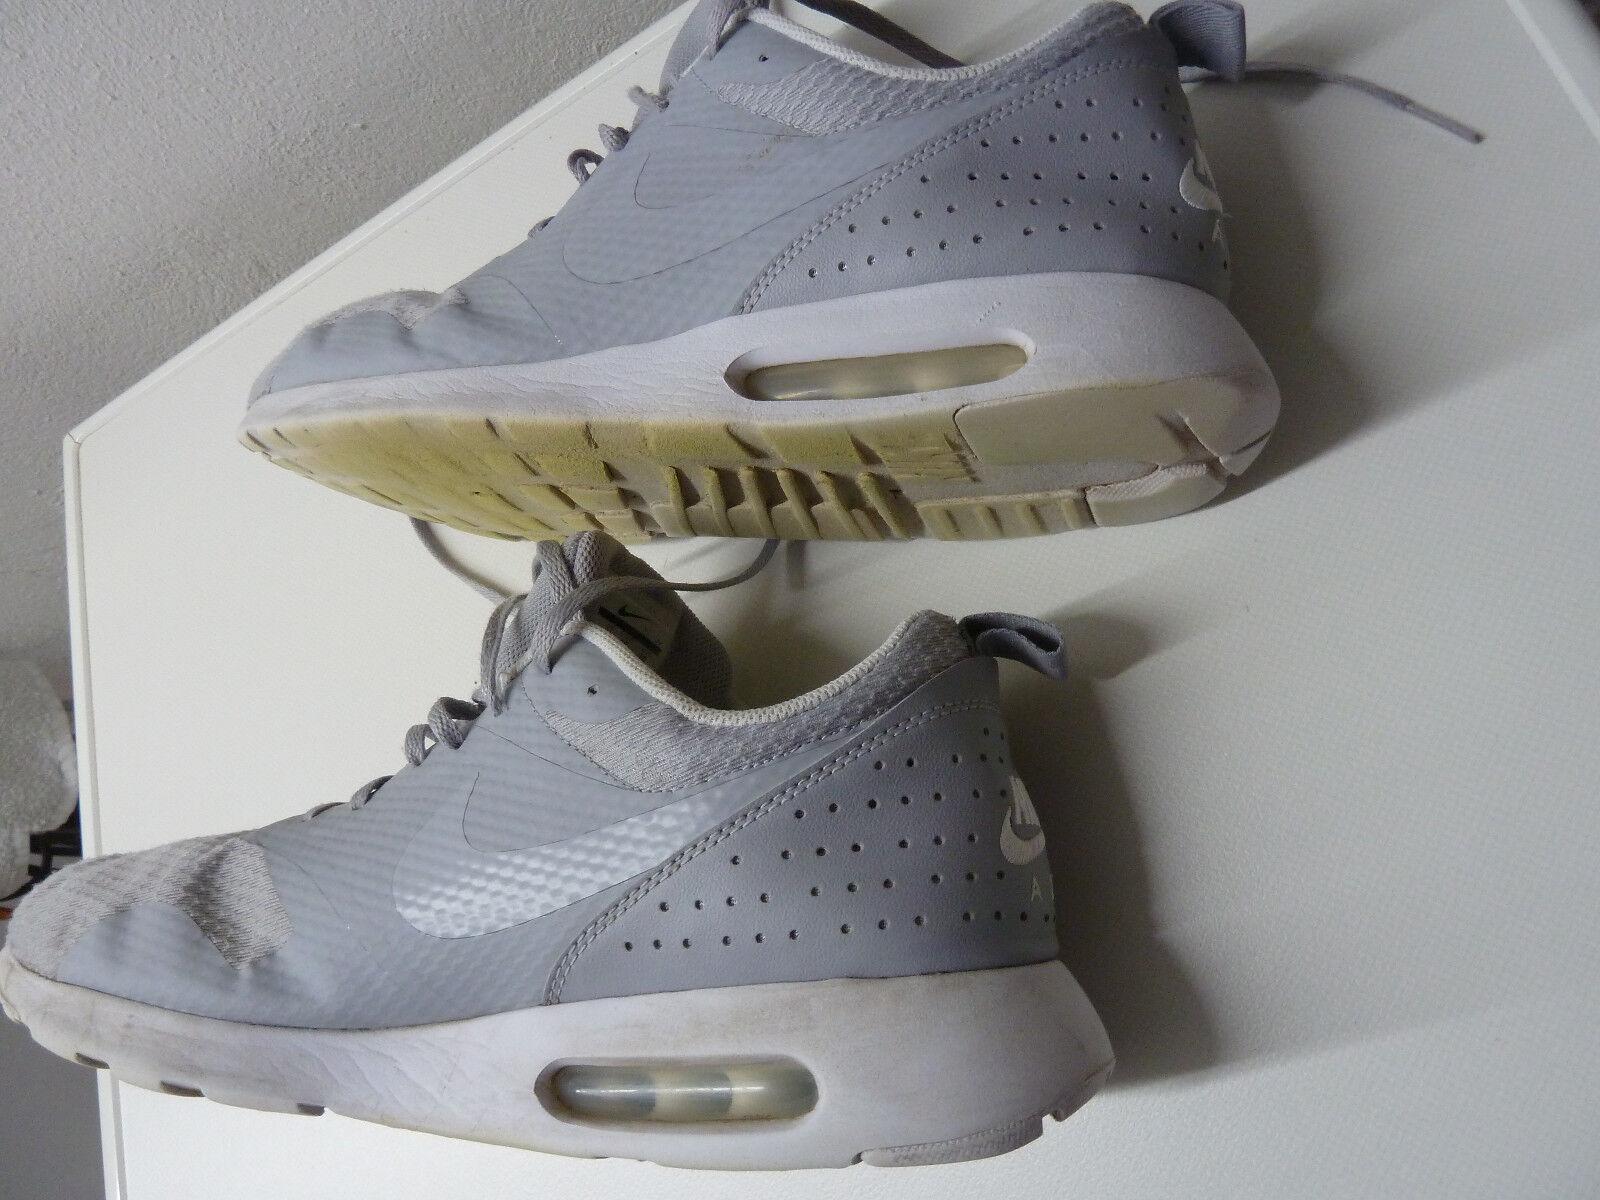 Nike AIR MAX Tavas Gr. 46   US 12   30 cm - grau Weiß Nike   705149-028